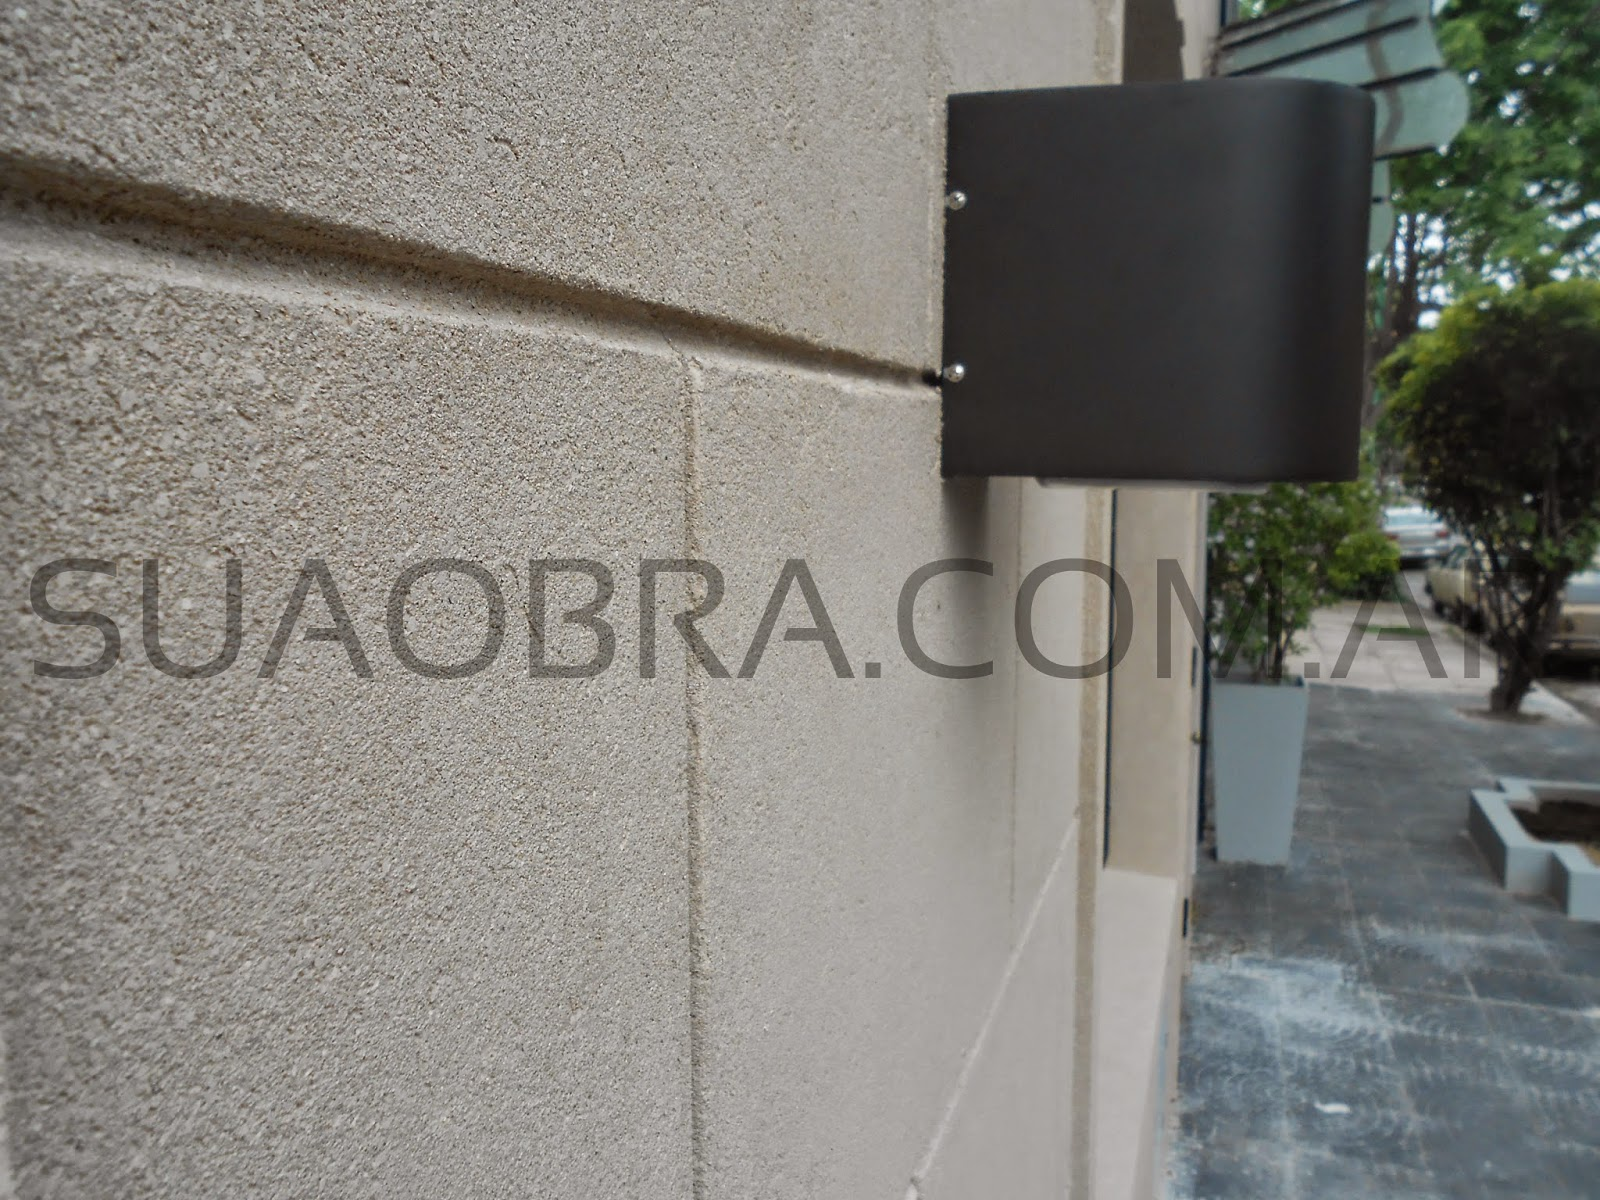 Tarquini revestimiento de paredes exteriores aplicacion revestimientos plasticos capital - Revestimiento de paredes exteriores baratos ...